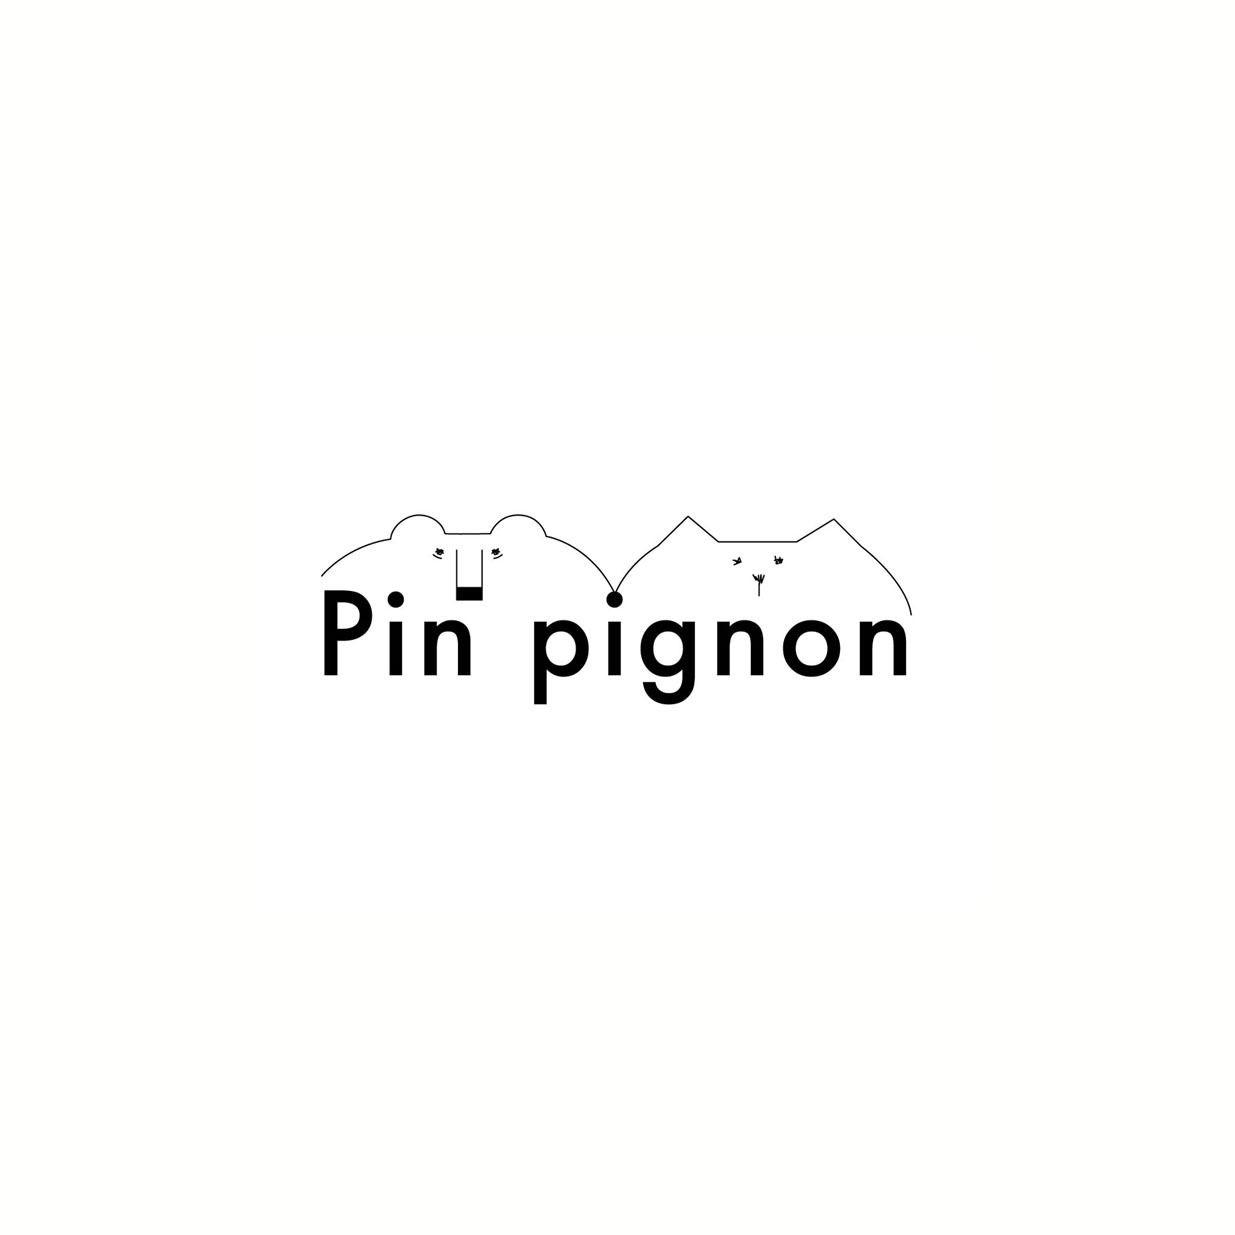 Pin pignon